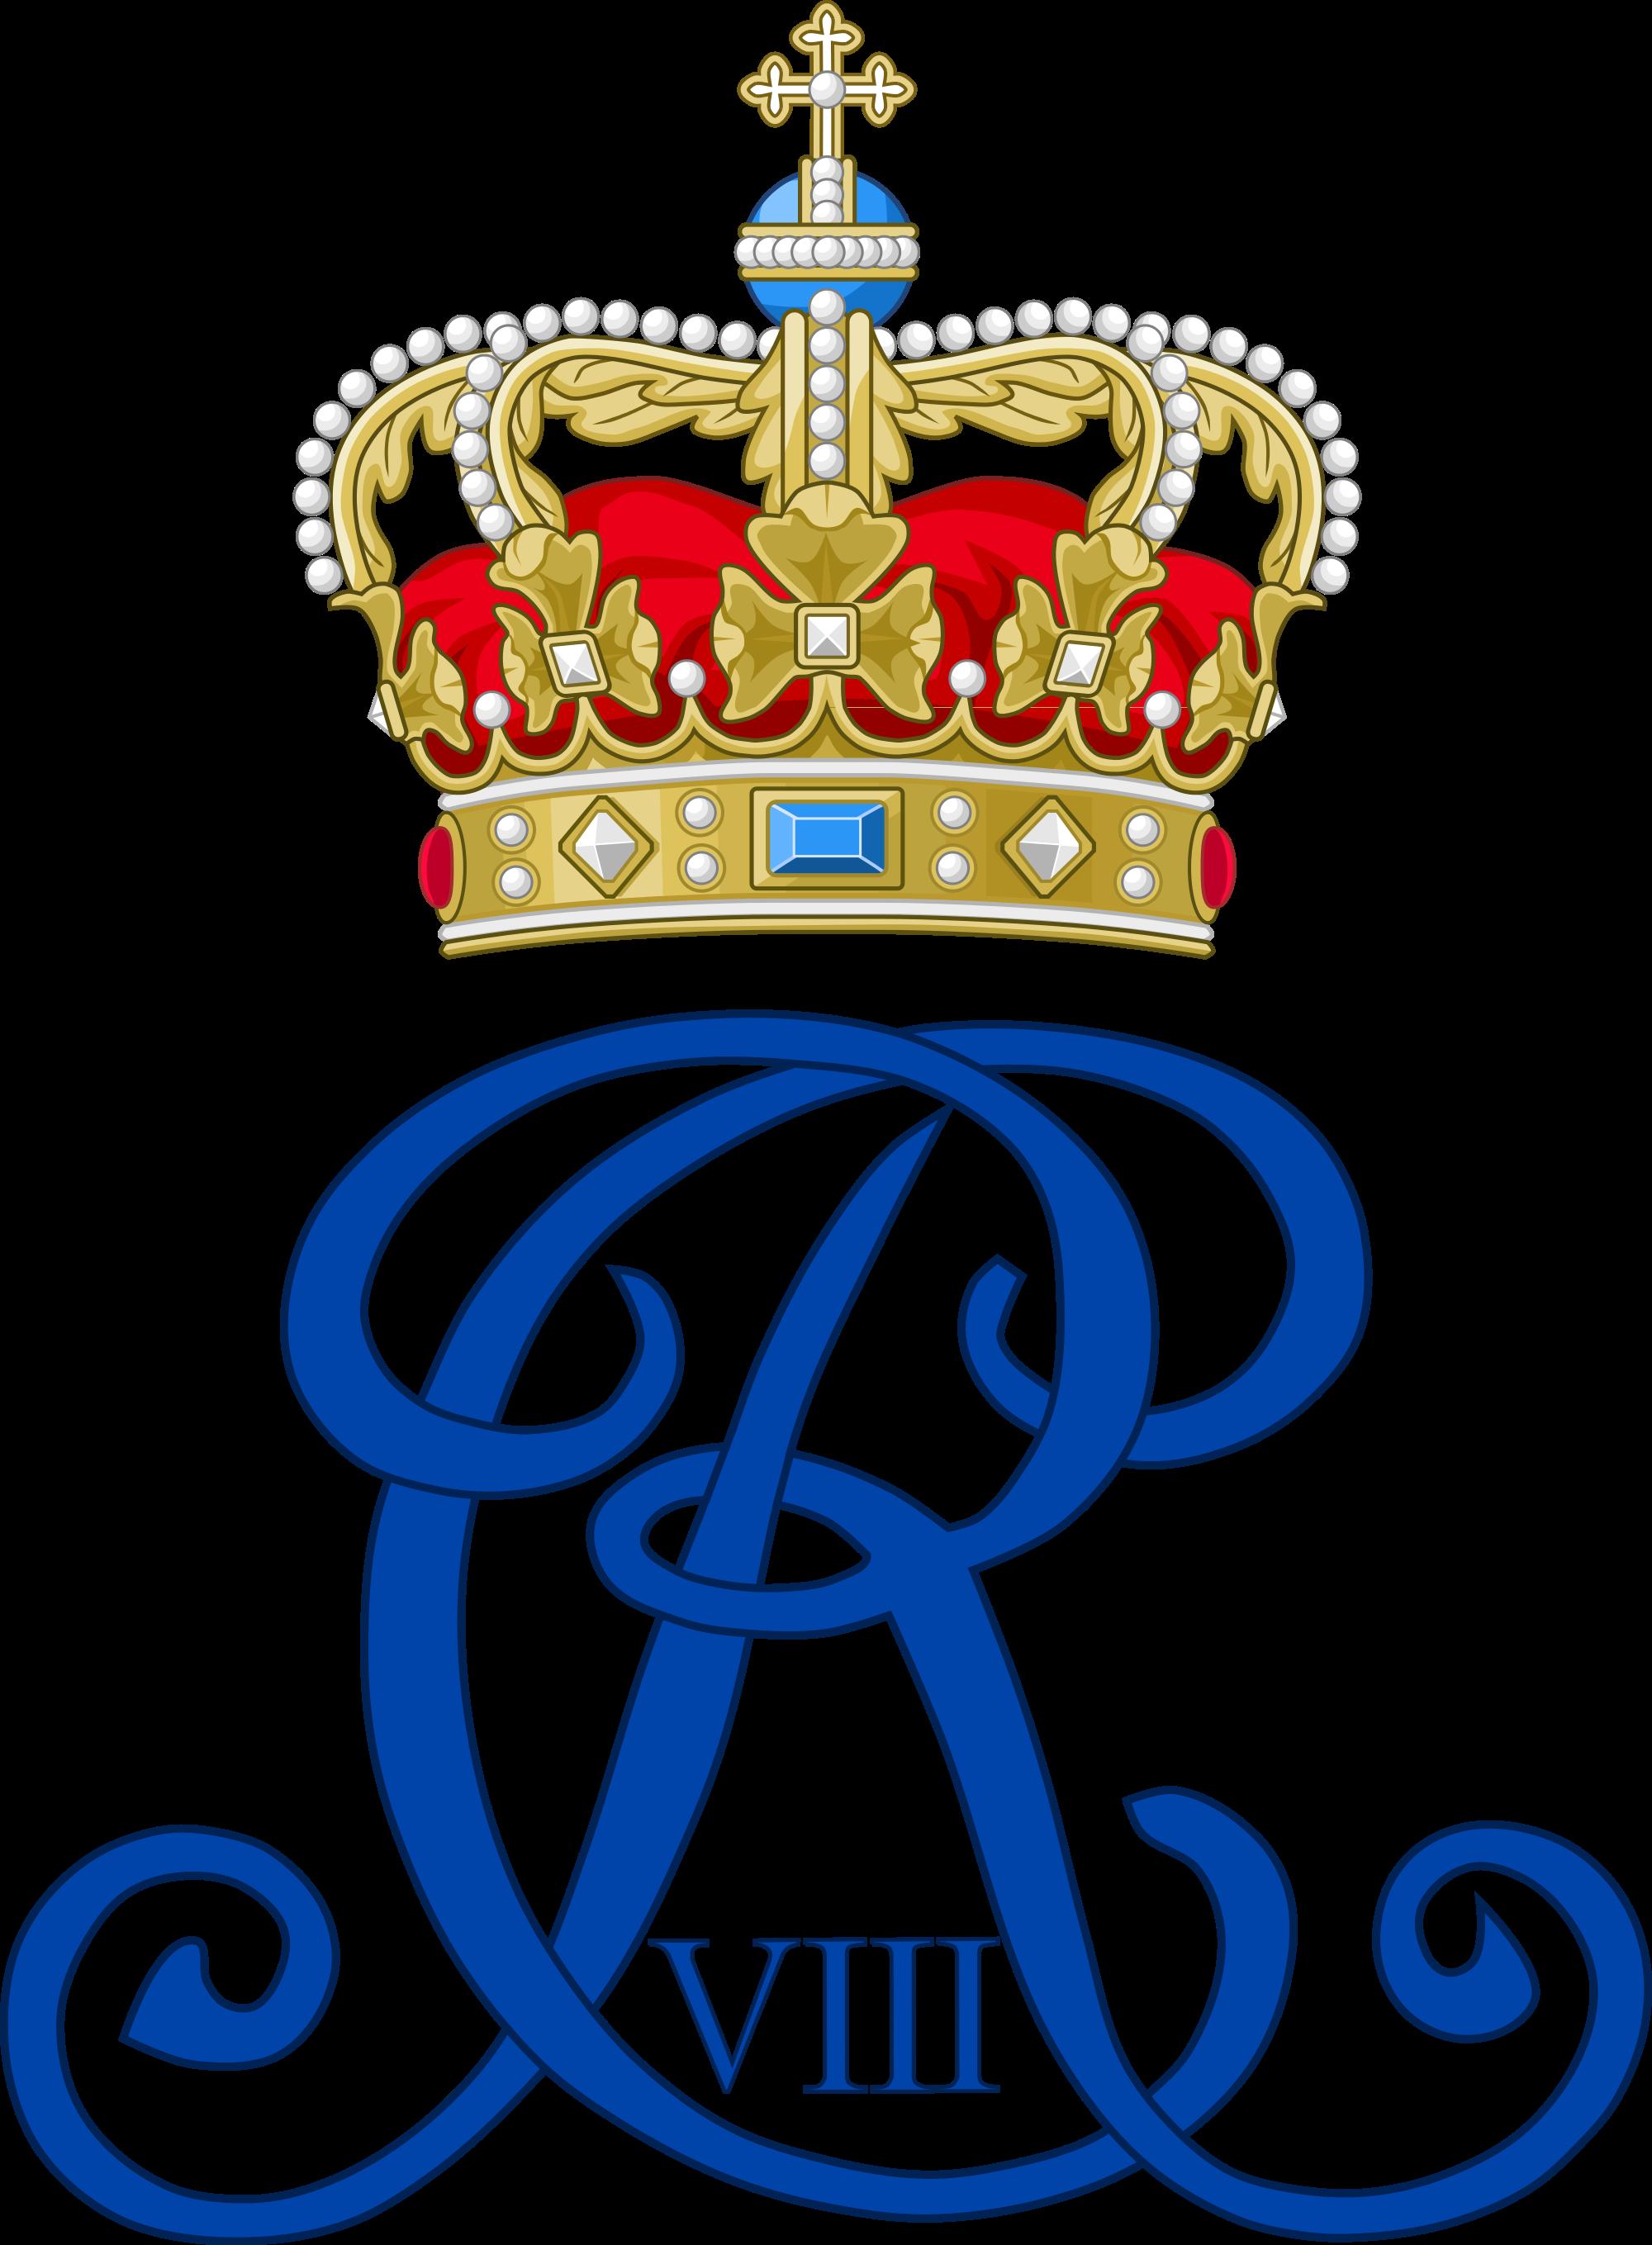 R clipart monogram. Royal of king christian